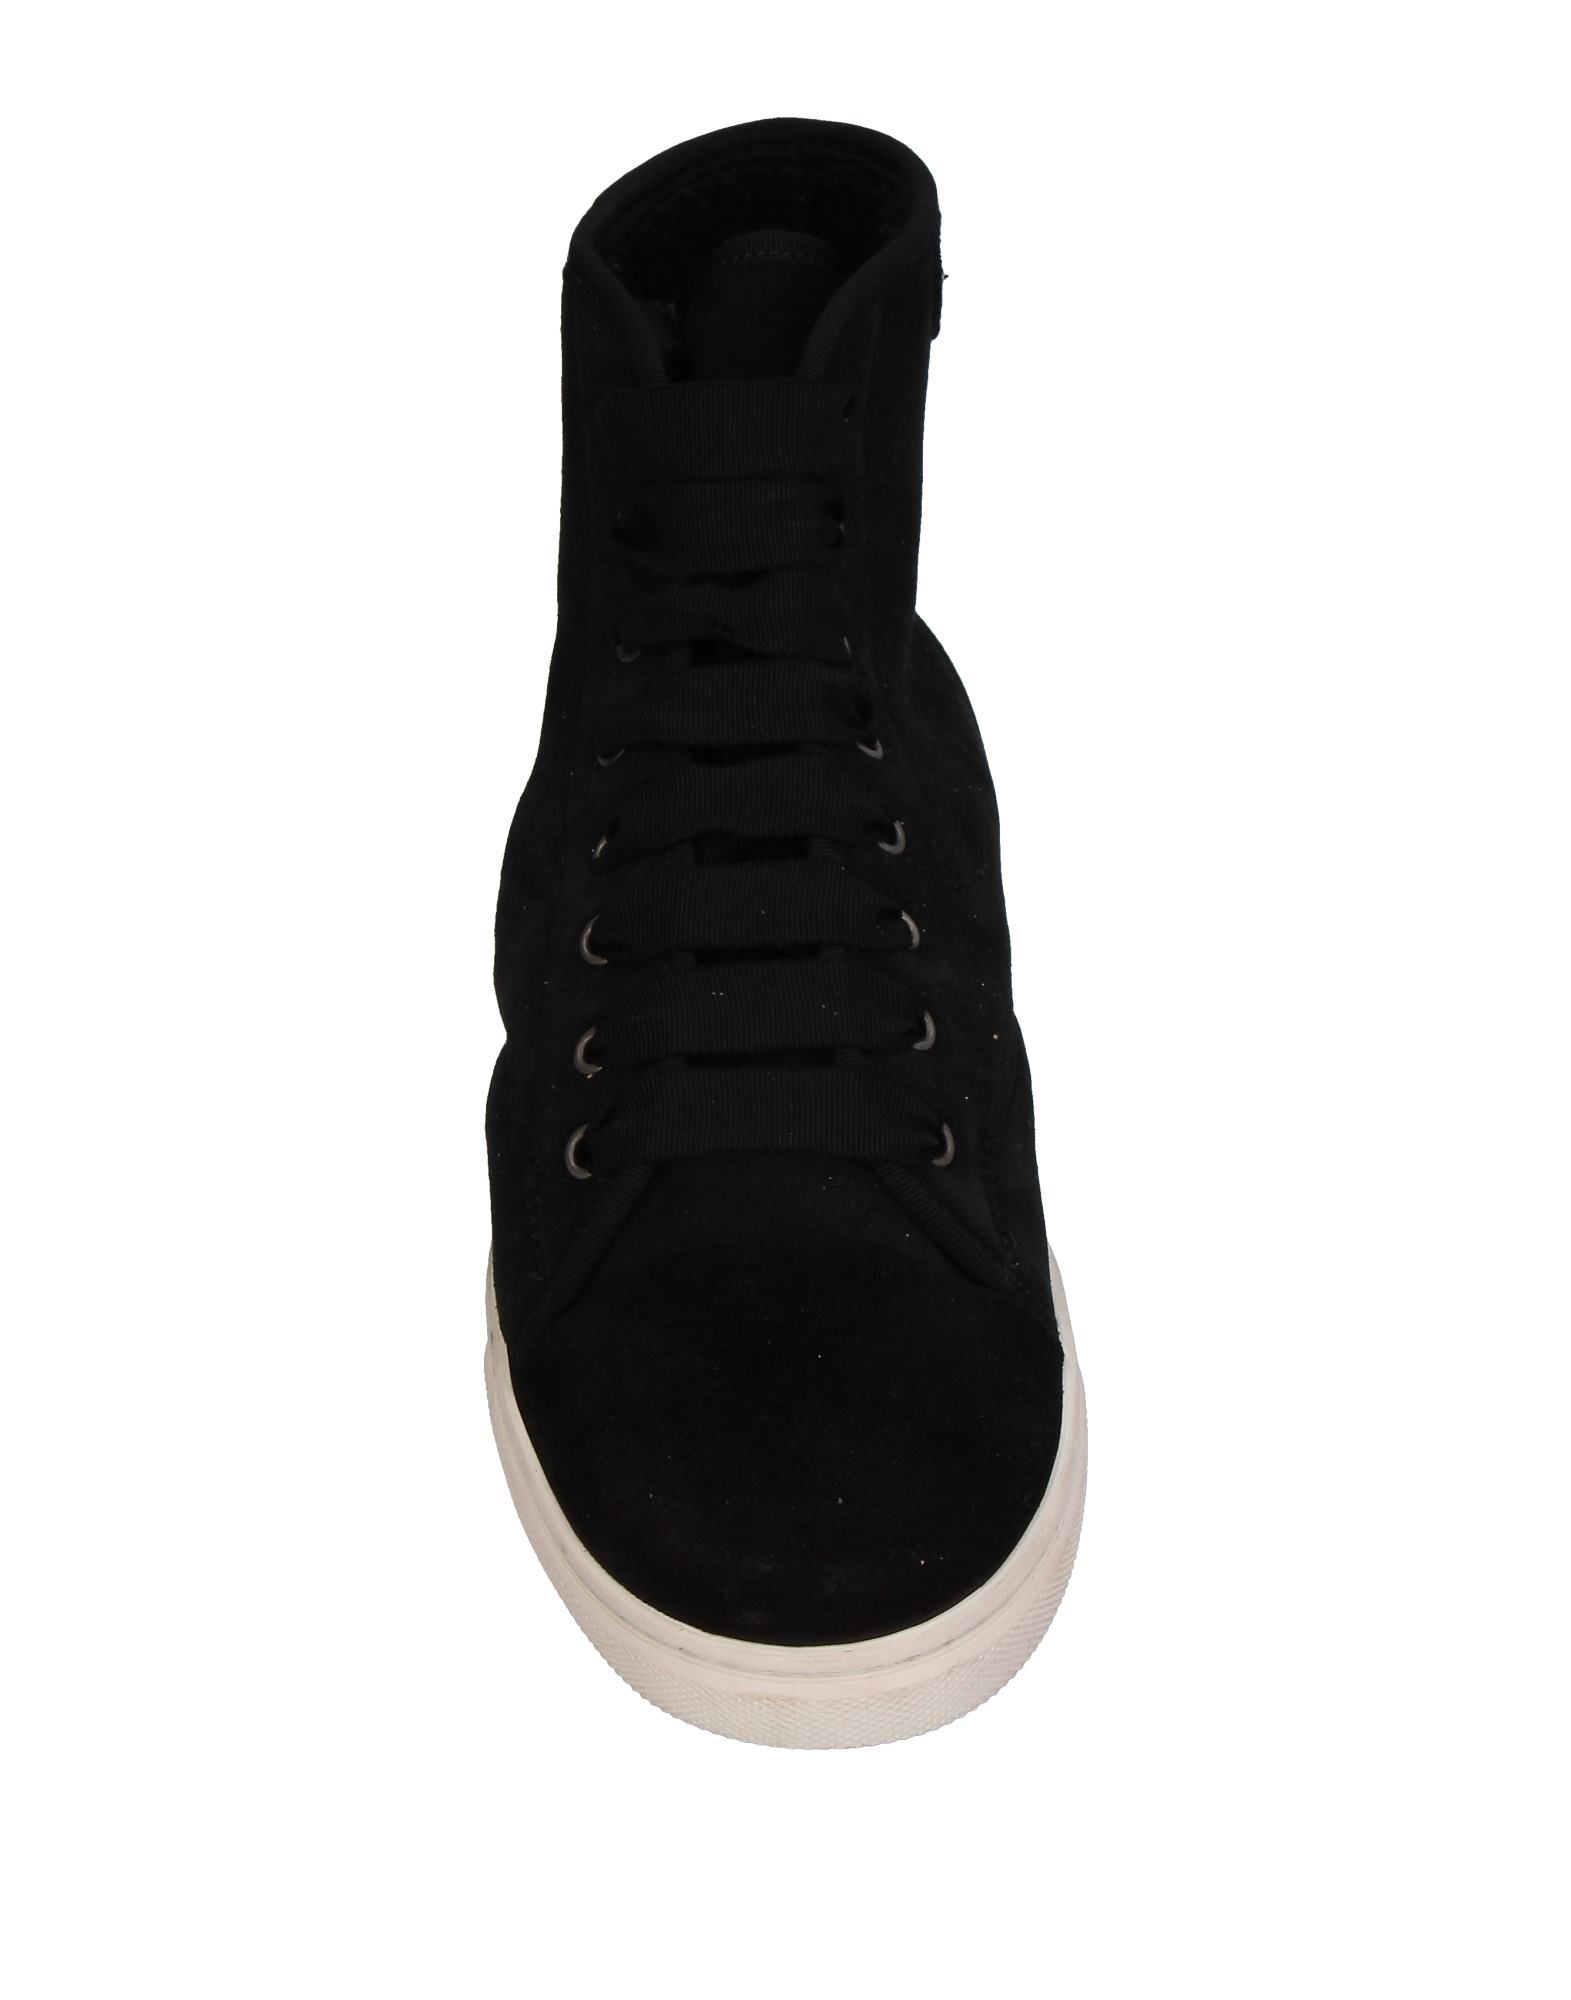 Lanvin Sneakers Damen  11410400SJGut aussehende strapazierfähige Schuhe